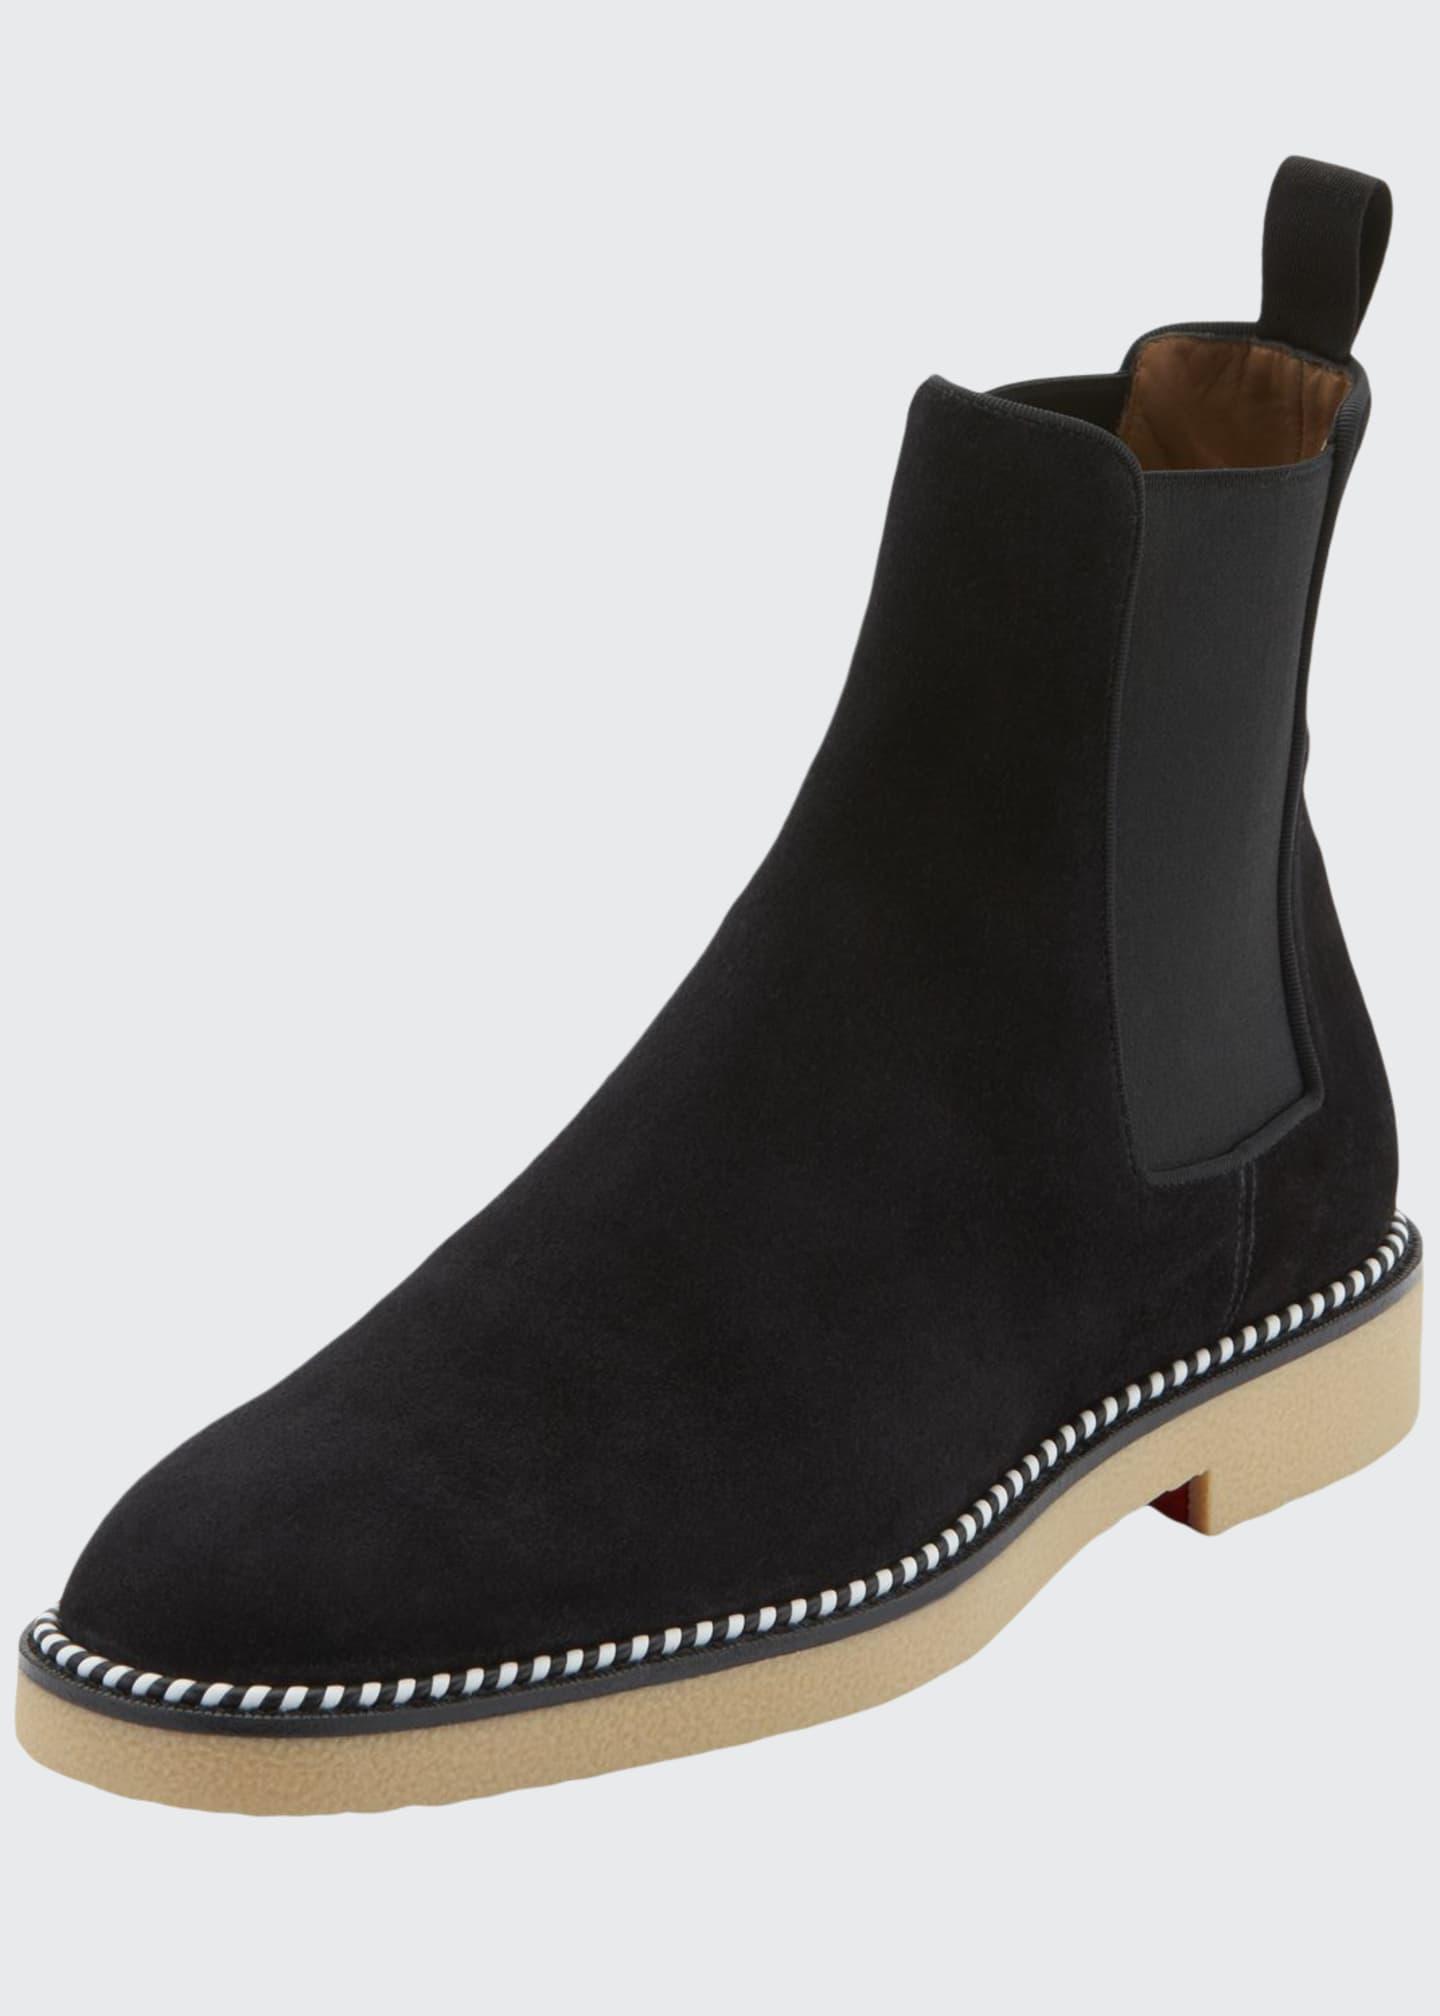 Christian Louboutin Men's Chelsea Crepe-Sole Suede Boots